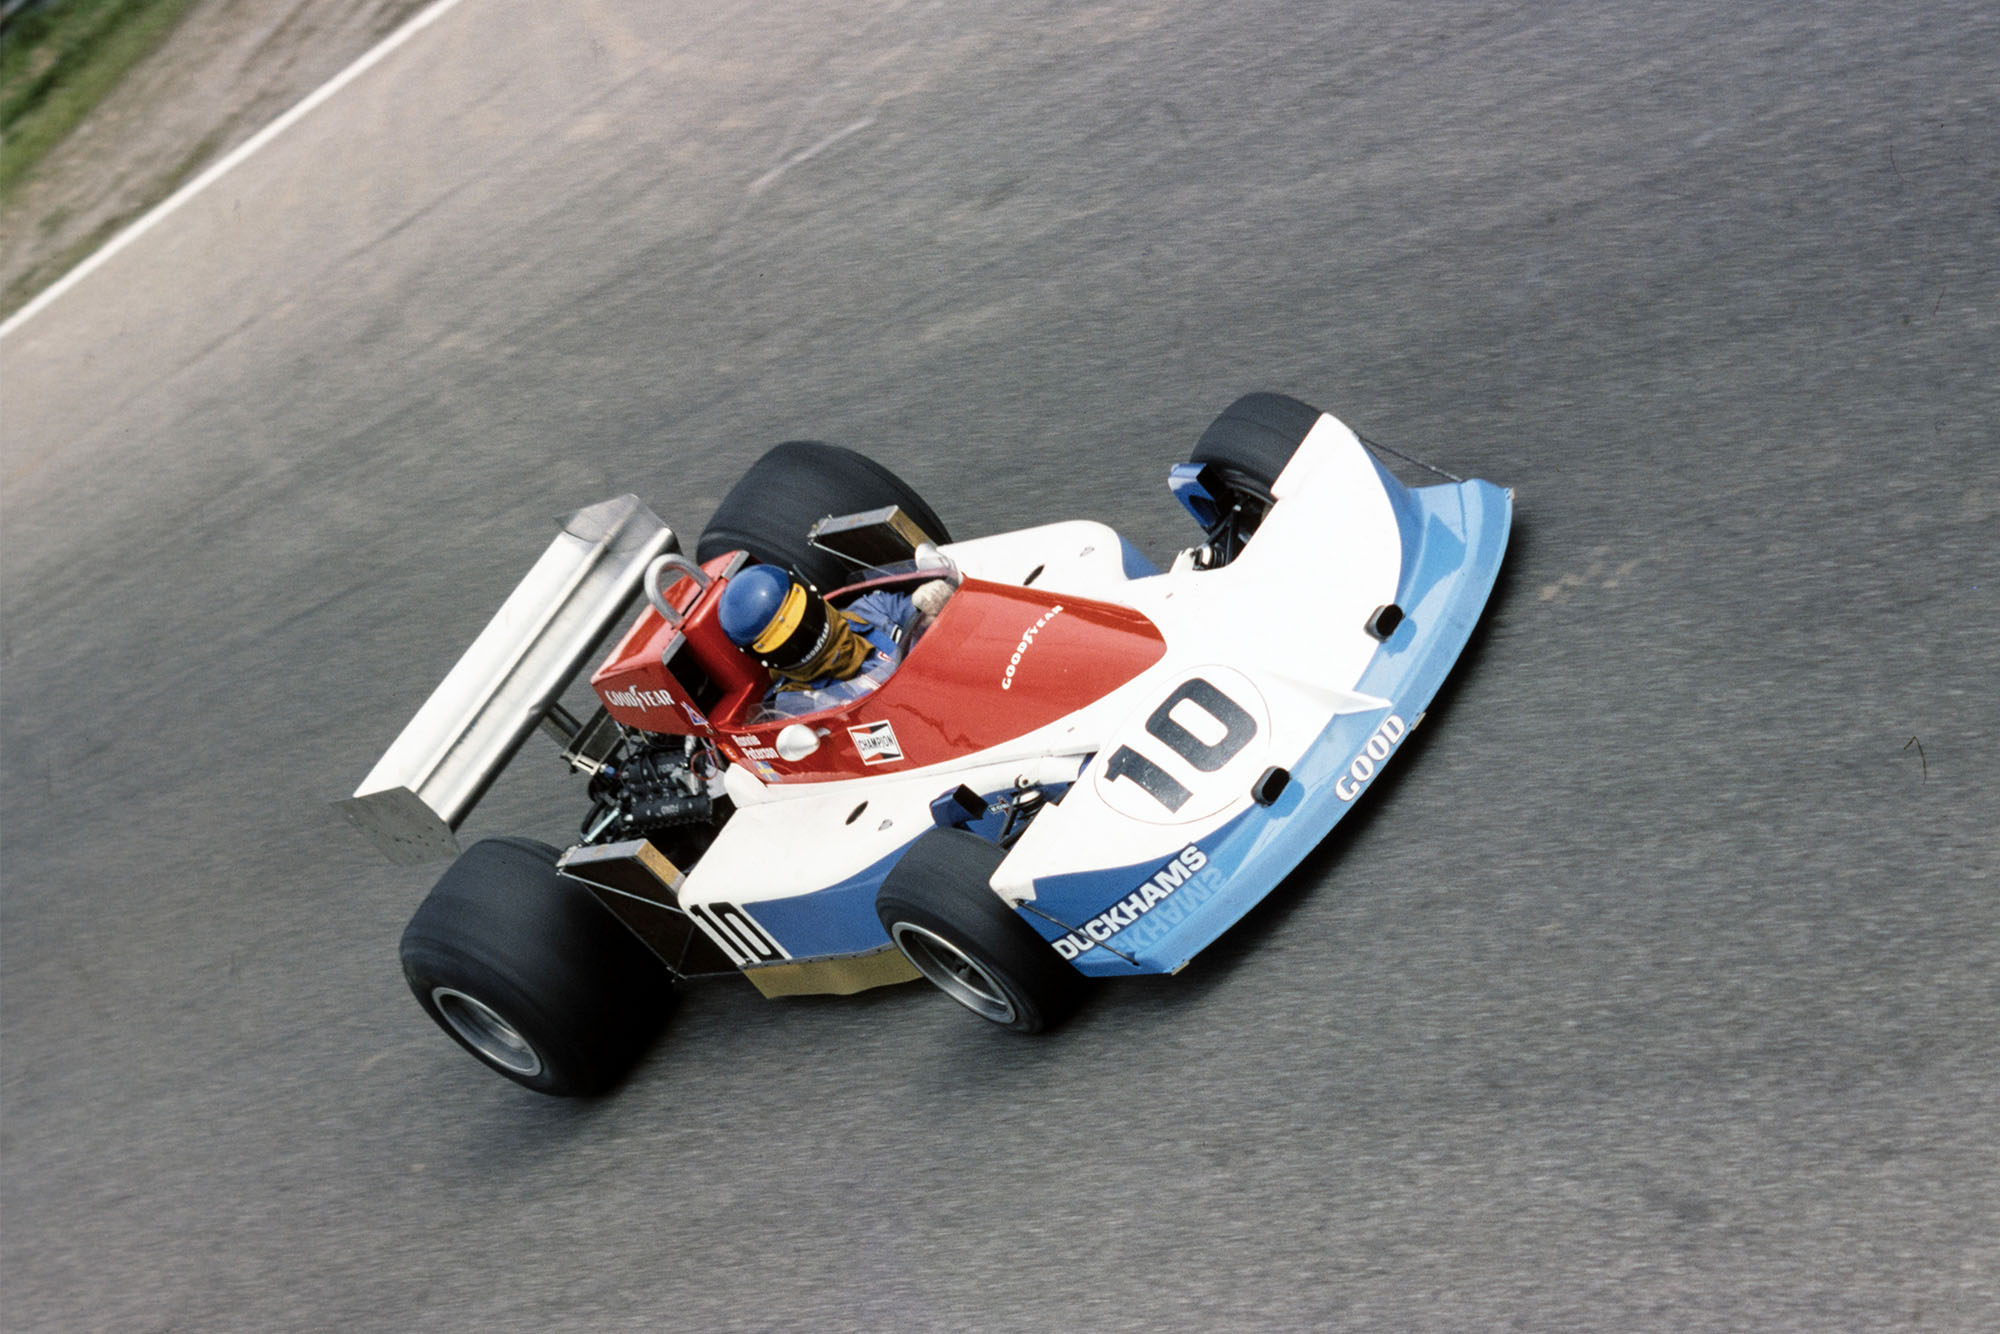 Ronnie Oeterson (March) at the 1976 Italian Grand Prix, Monza.